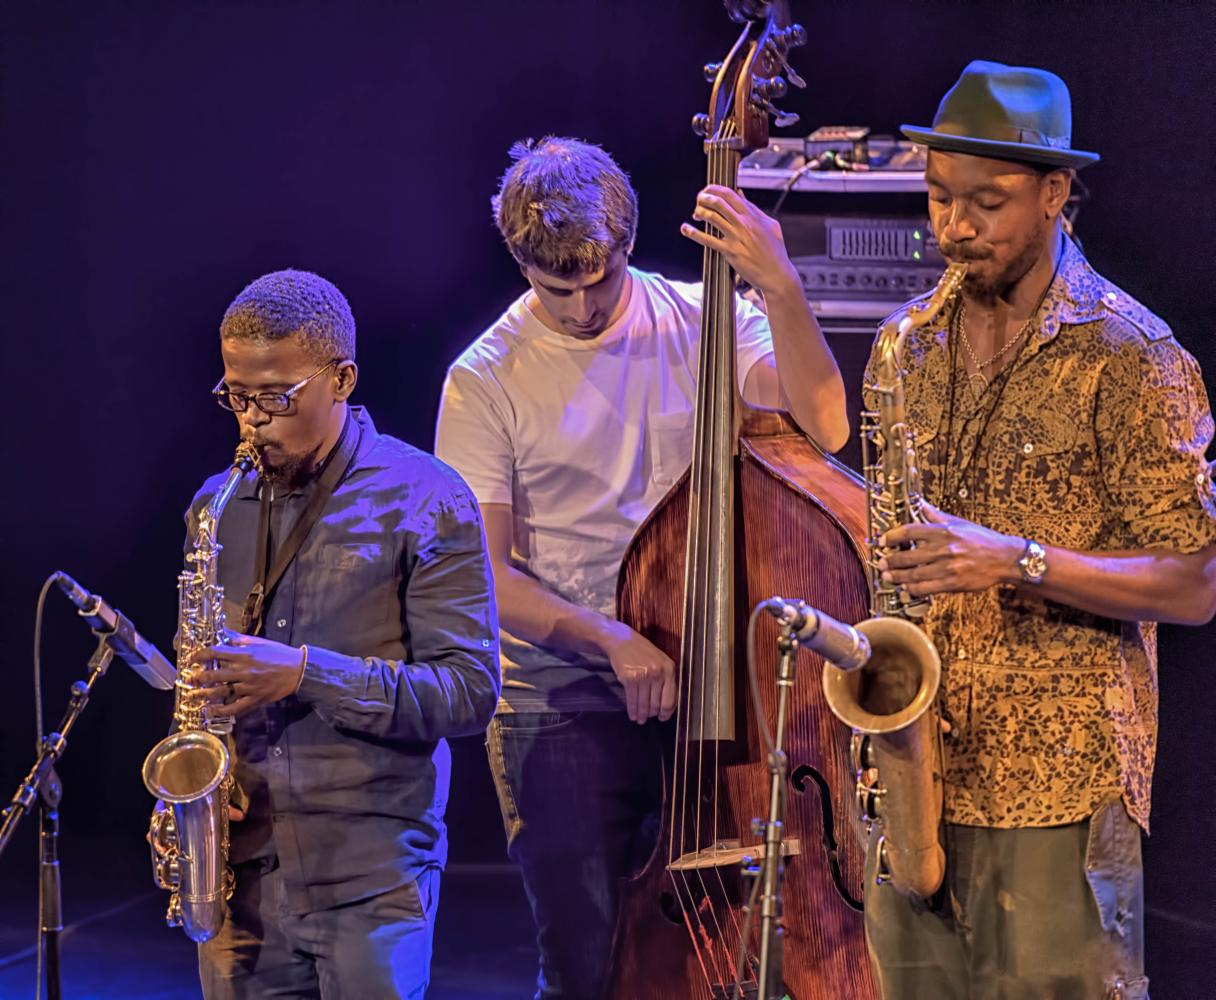 Mthunzi Mvubu, Ariel Zamonsky and Shabaka Hutchings with Shabaka and the Ancestors at The Montreal International Jazz Festival 2017